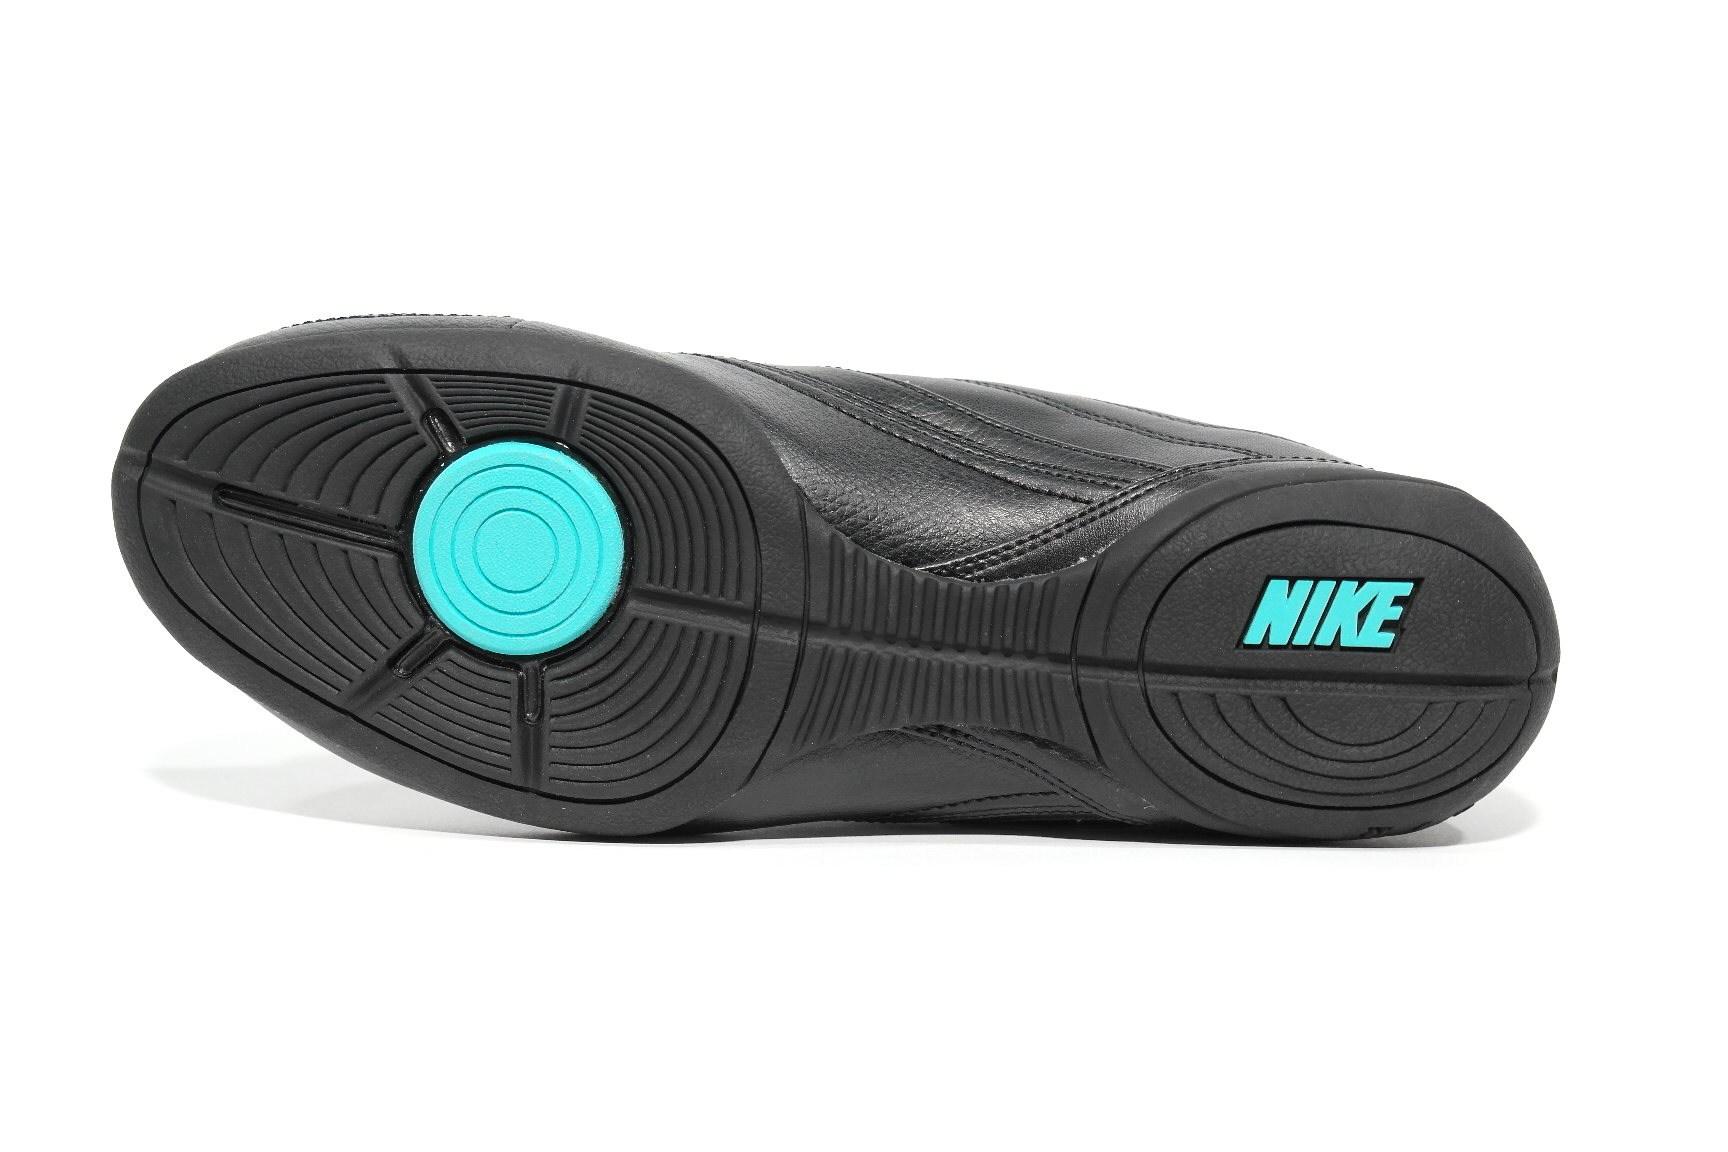 Nike Fitness Schoenen Dames Zwart